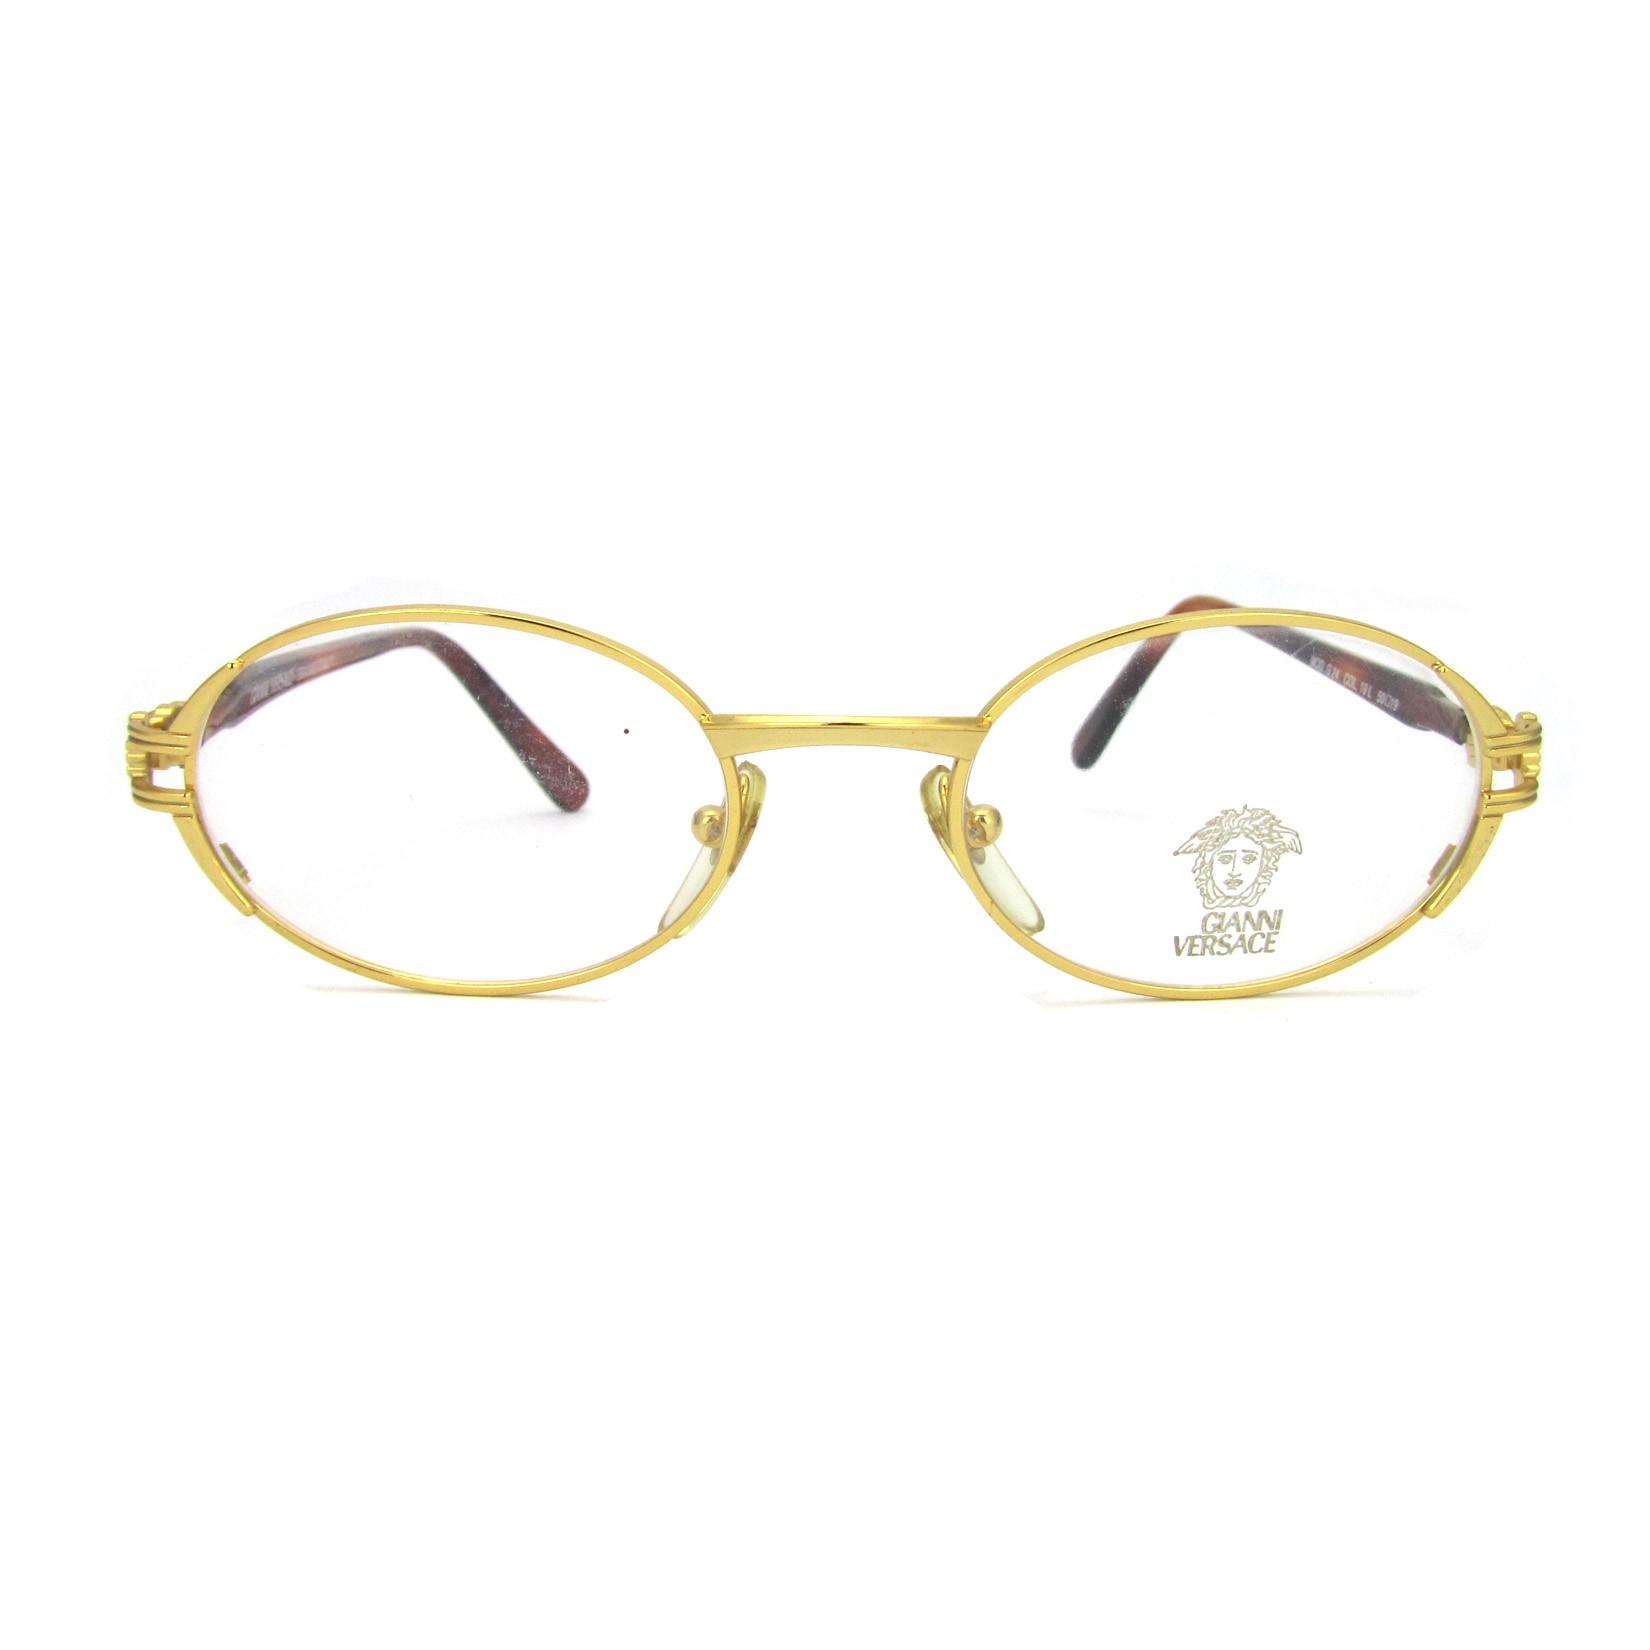 Versace | Sunglasses and Prescription Eyeglasses | Vintage Eyeglass ...